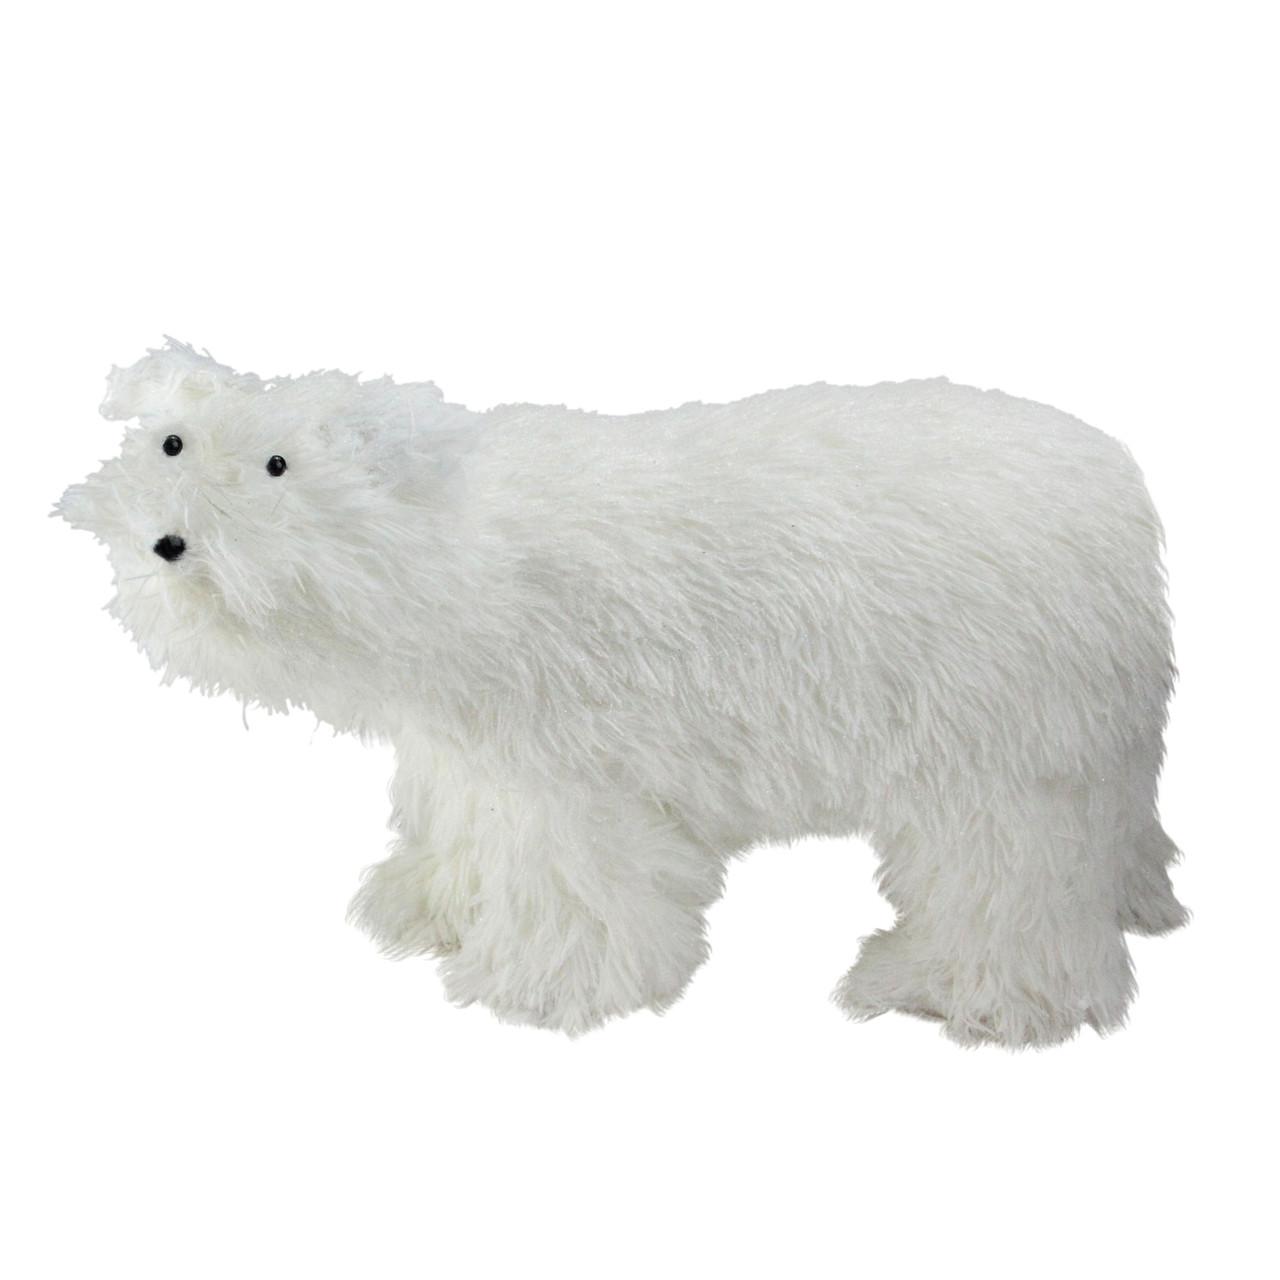 17 white standing polar bear christmas figure decoration 32638093